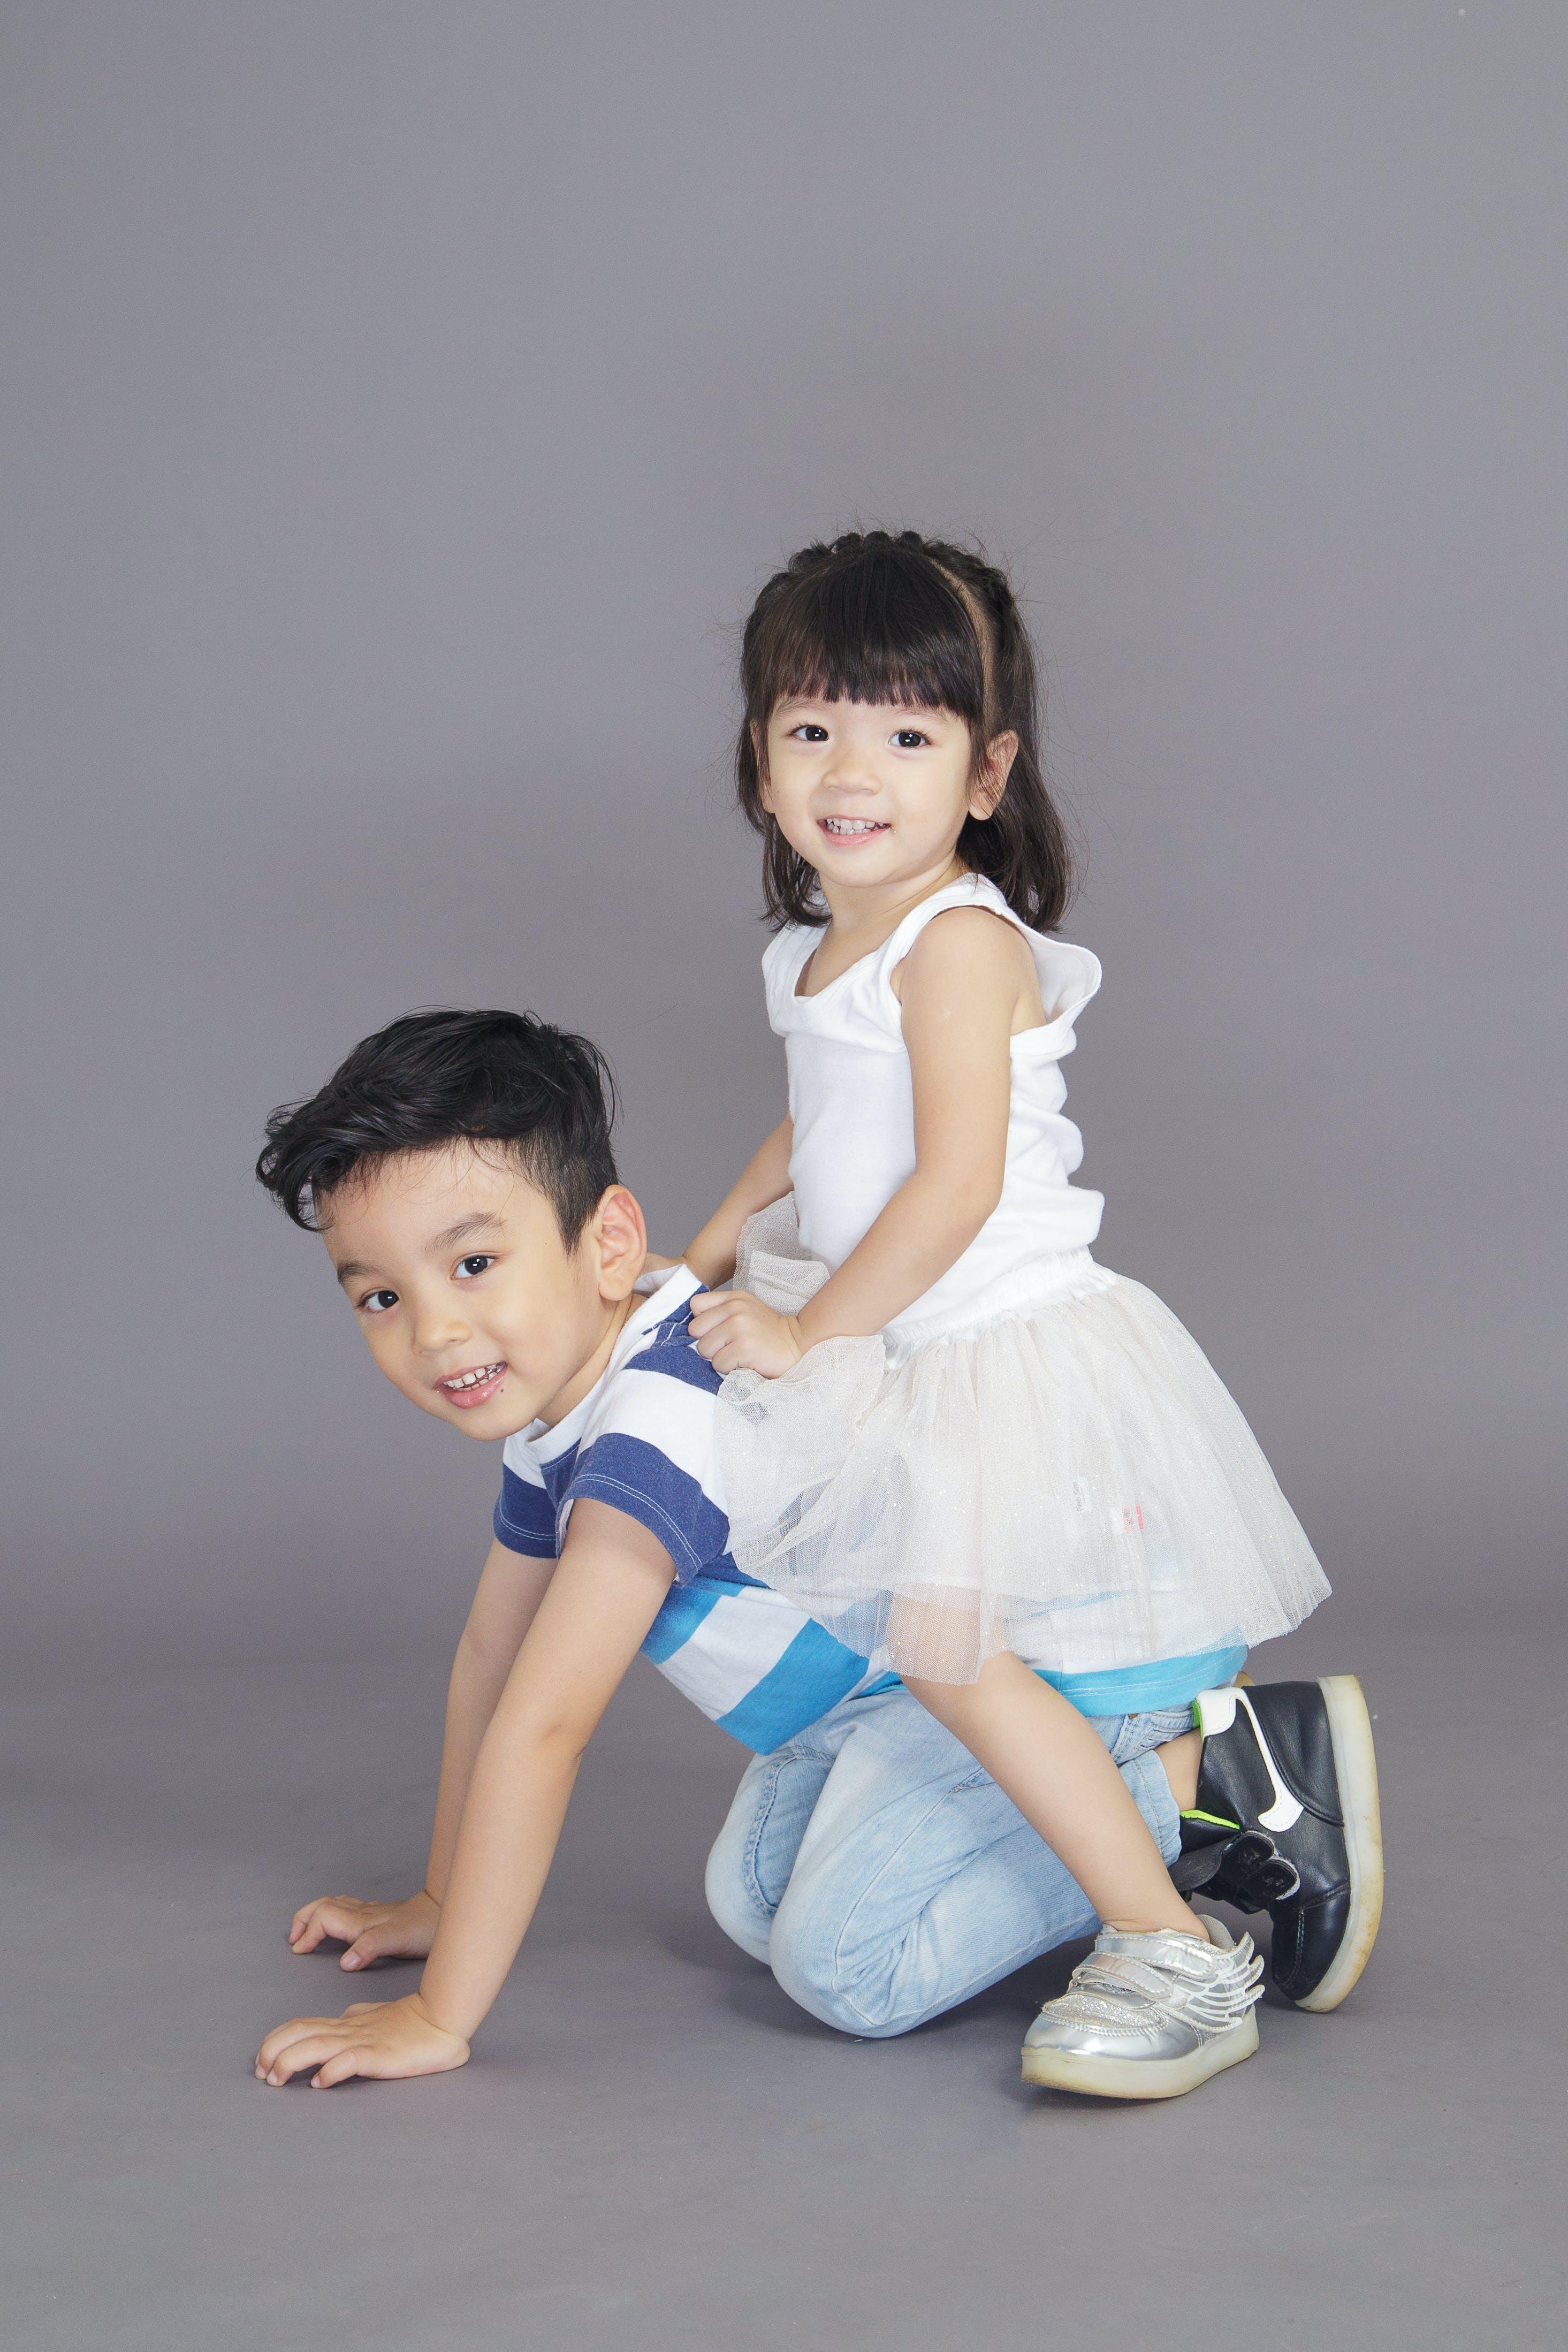 Girl in White Dress Sitting on Crawling Boy's Back